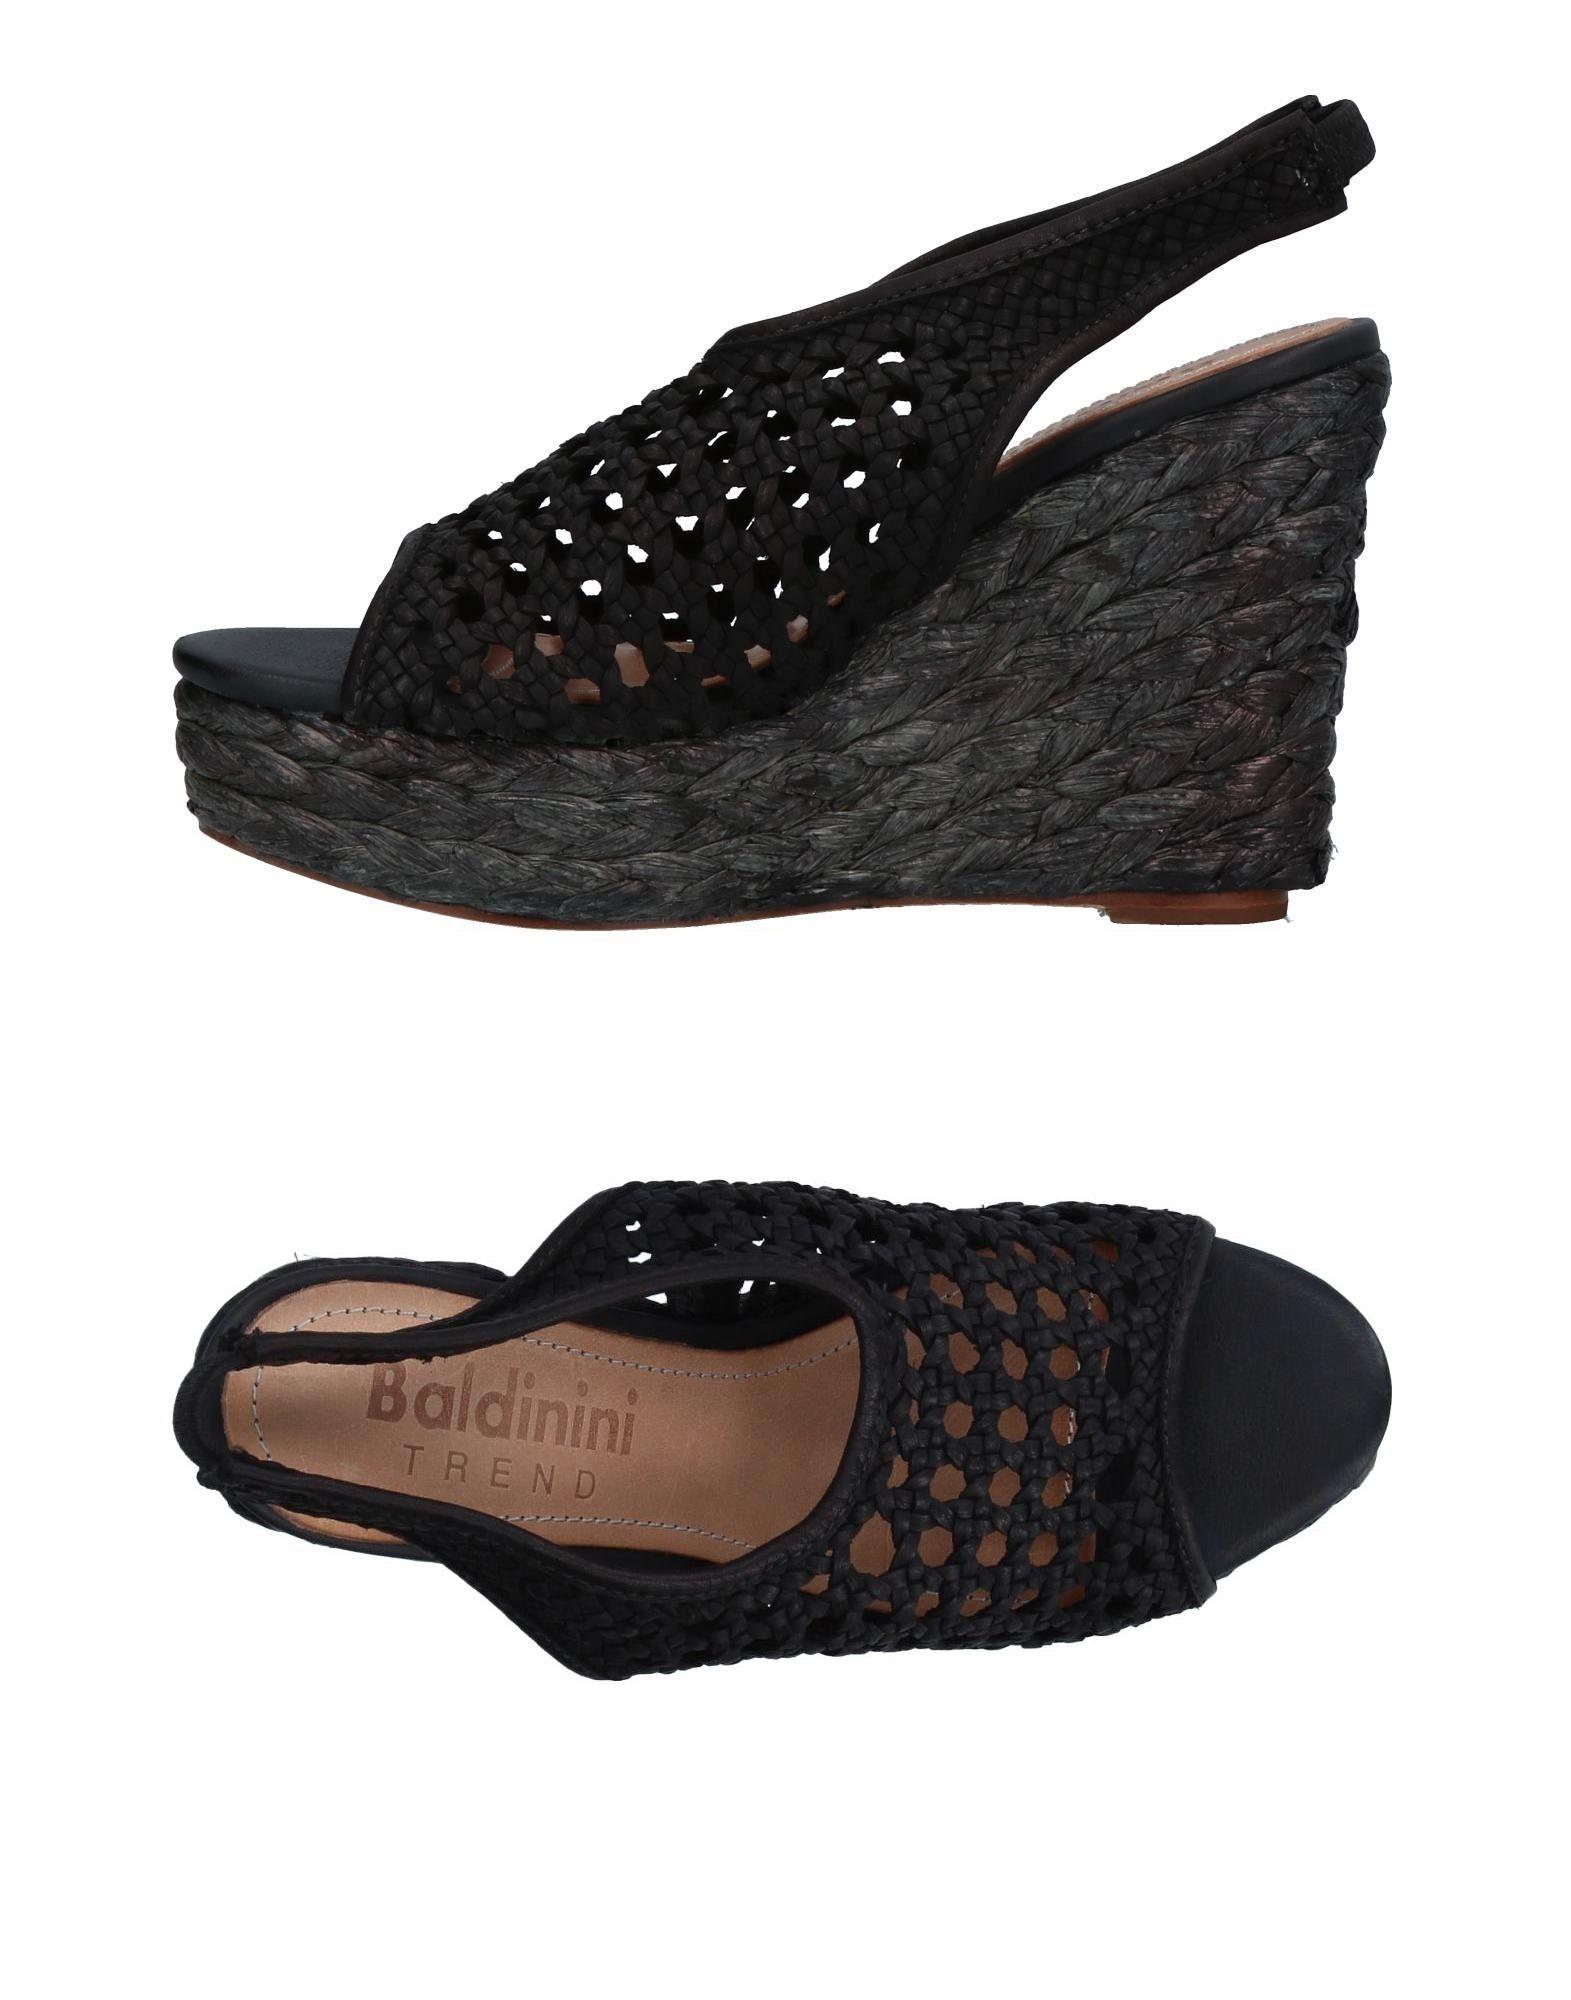 Baldinini Trend Sandalen Damen  11107868BI Gute Qualität beliebte Schuhe